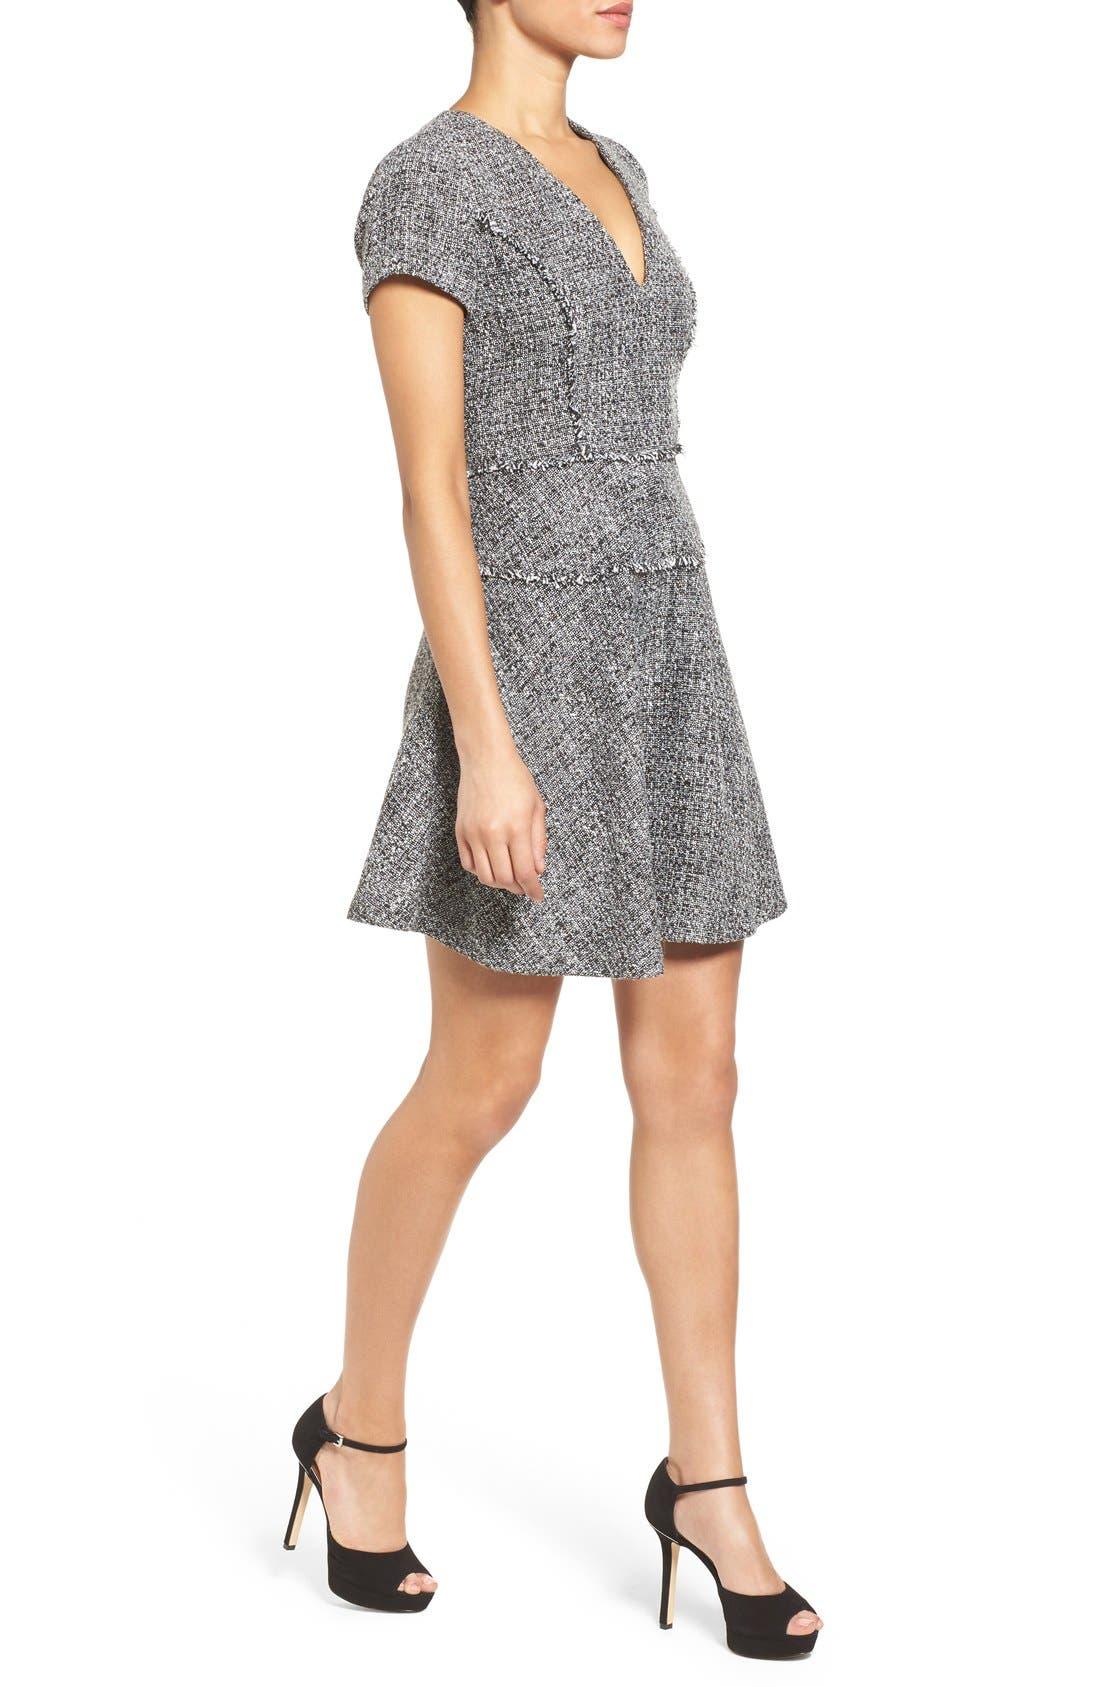 MICHAEL MICHAEL KORS,                             Tweed Fit & Flare Dress,                             Alternate thumbnail 3, color,                             001